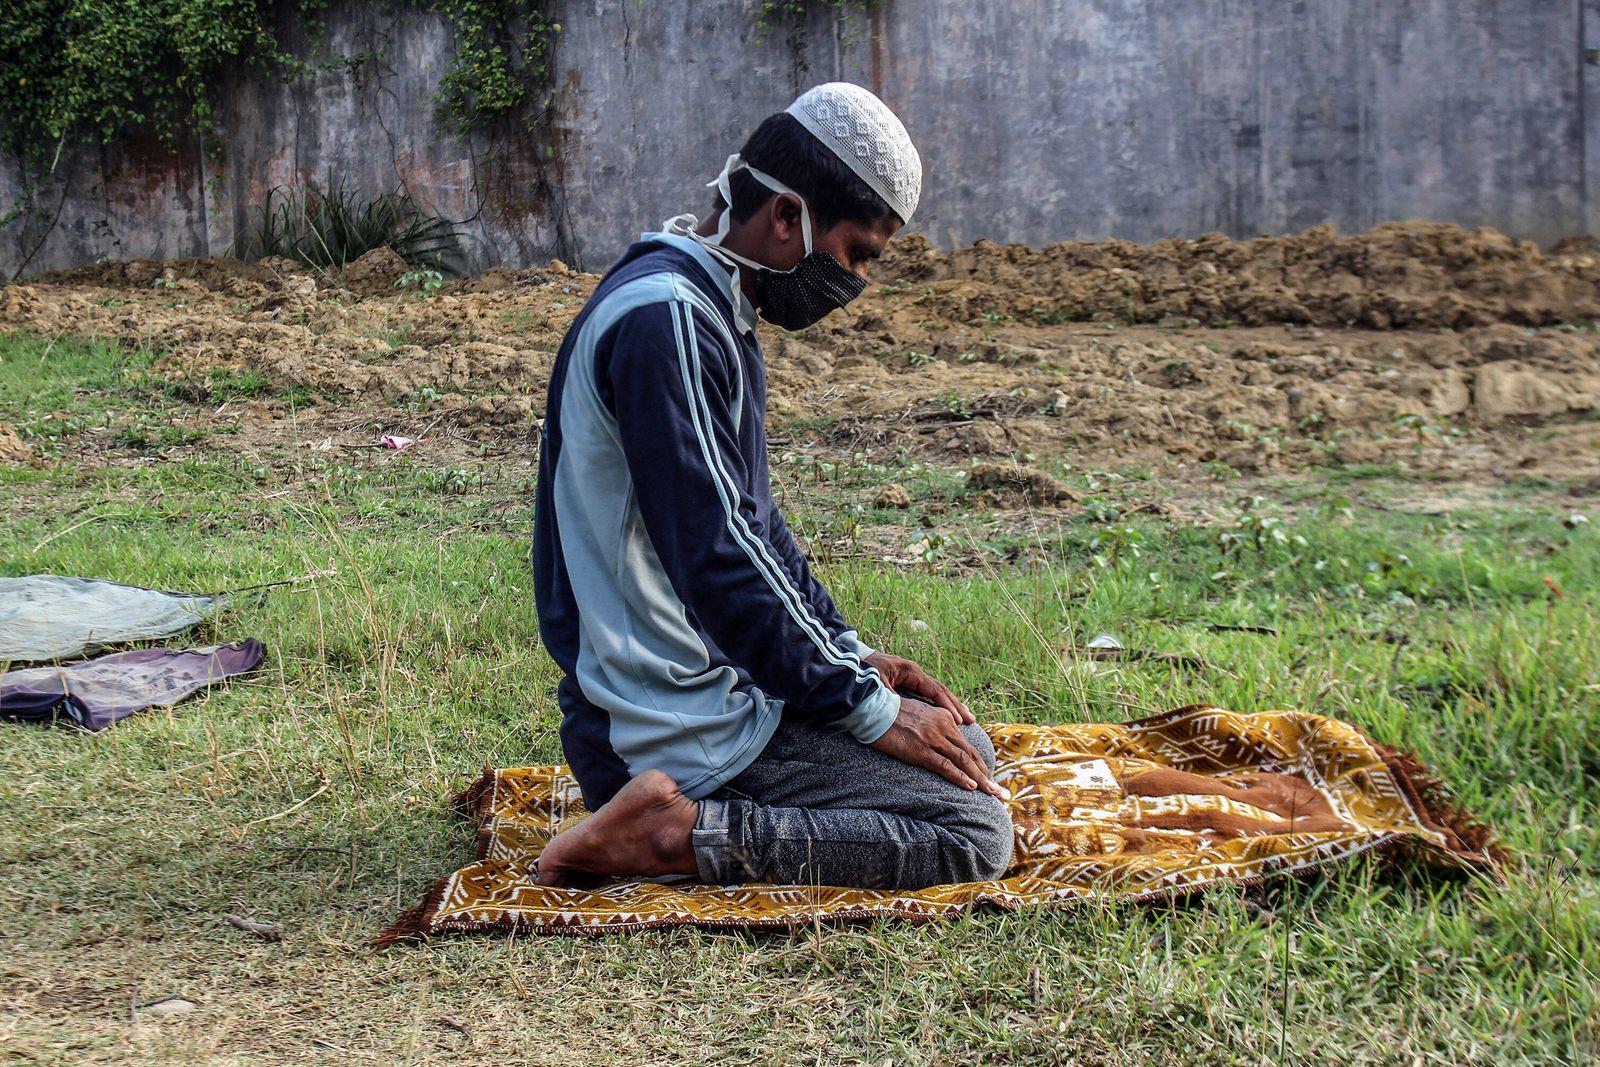 September 7, 2020, Lhokseumawe, Indonesia: A Rohingya Muslim man wearing a facemask performs prayers after being evacuat